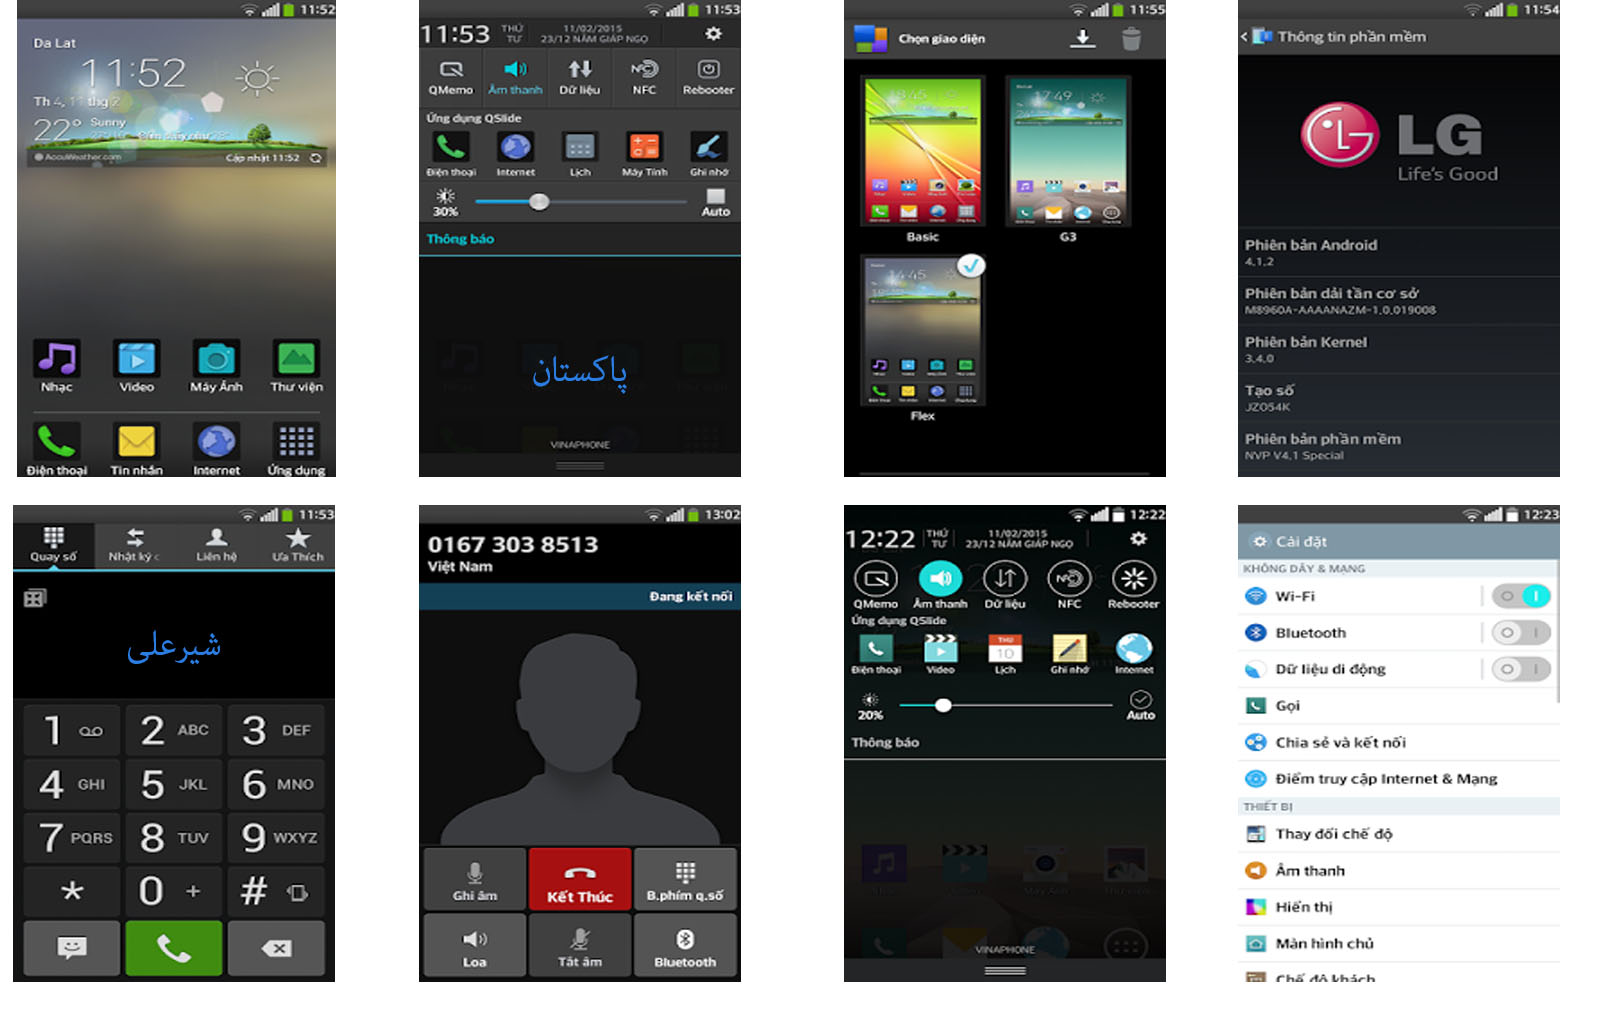 LG F160 L/S/K Best Rom With Galaxy S4,G3 HTC AND XPERIA